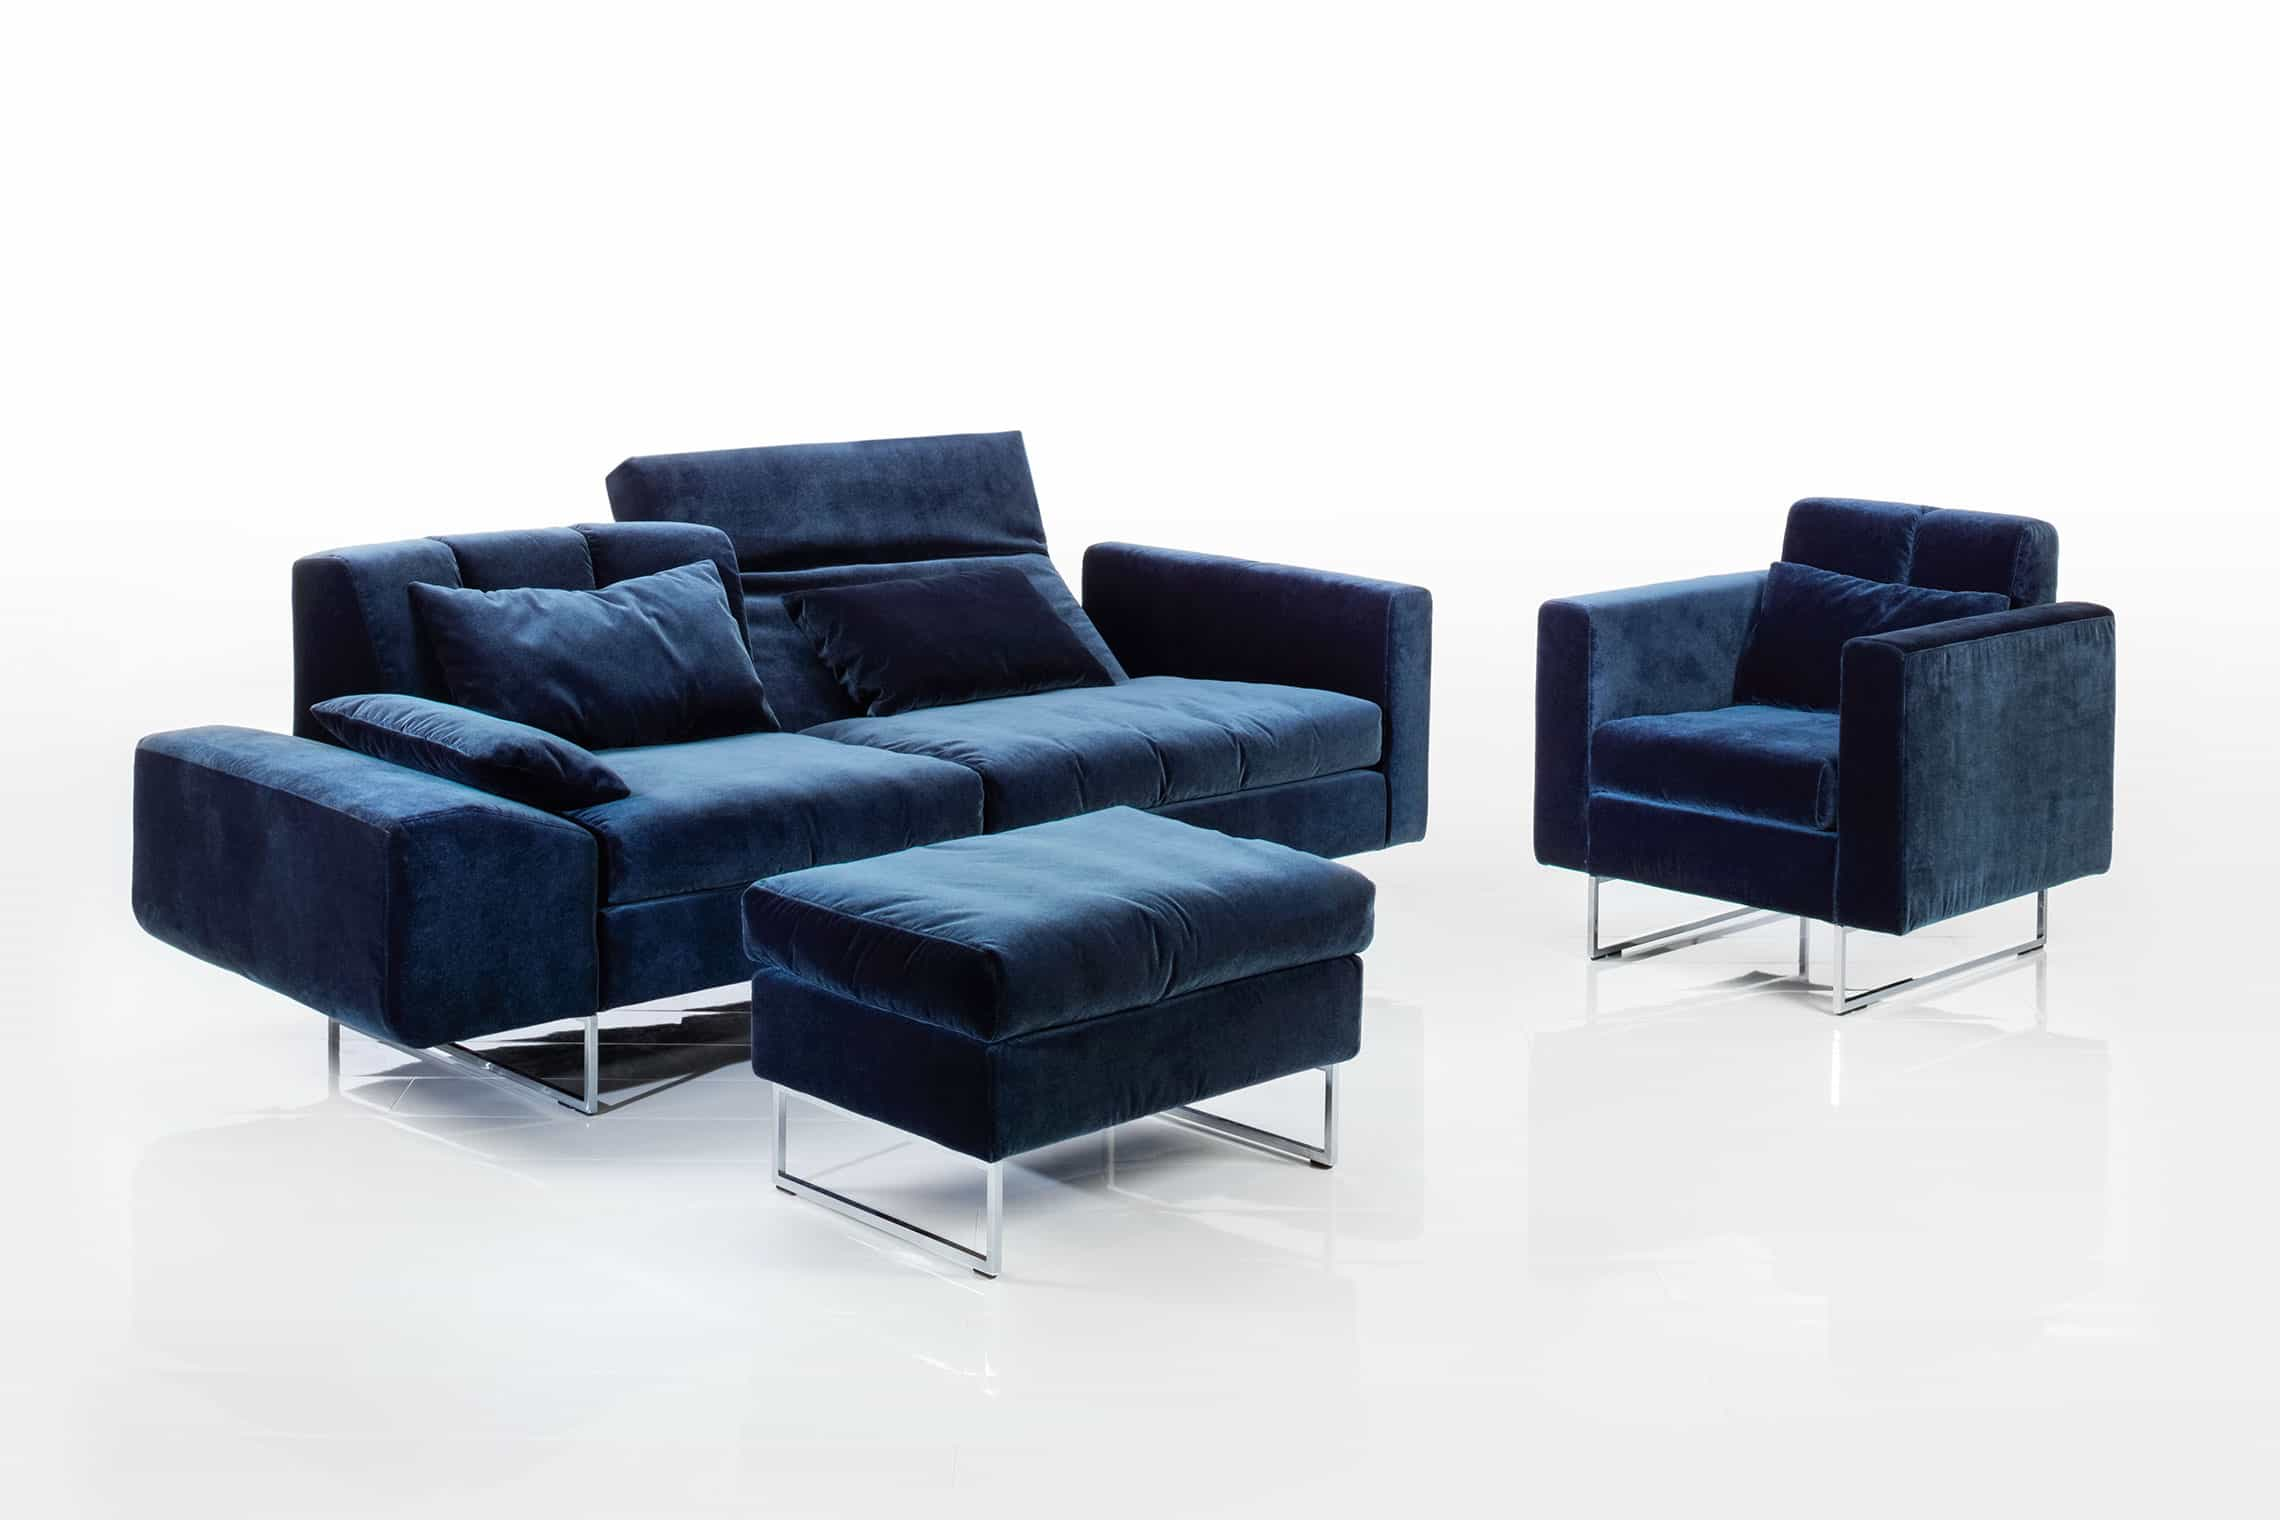 neu bei uns in f rth sofa embrace von br hl. Black Bedroom Furniture Sets. Home Design Ideas